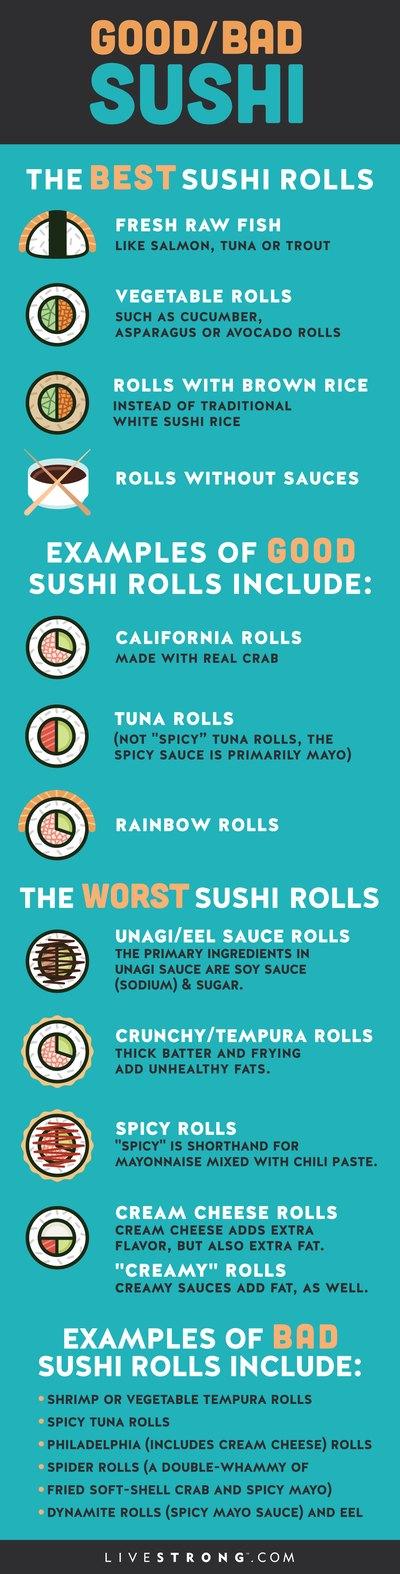 Fresh raw fish such as salmon sushi is a good choice.